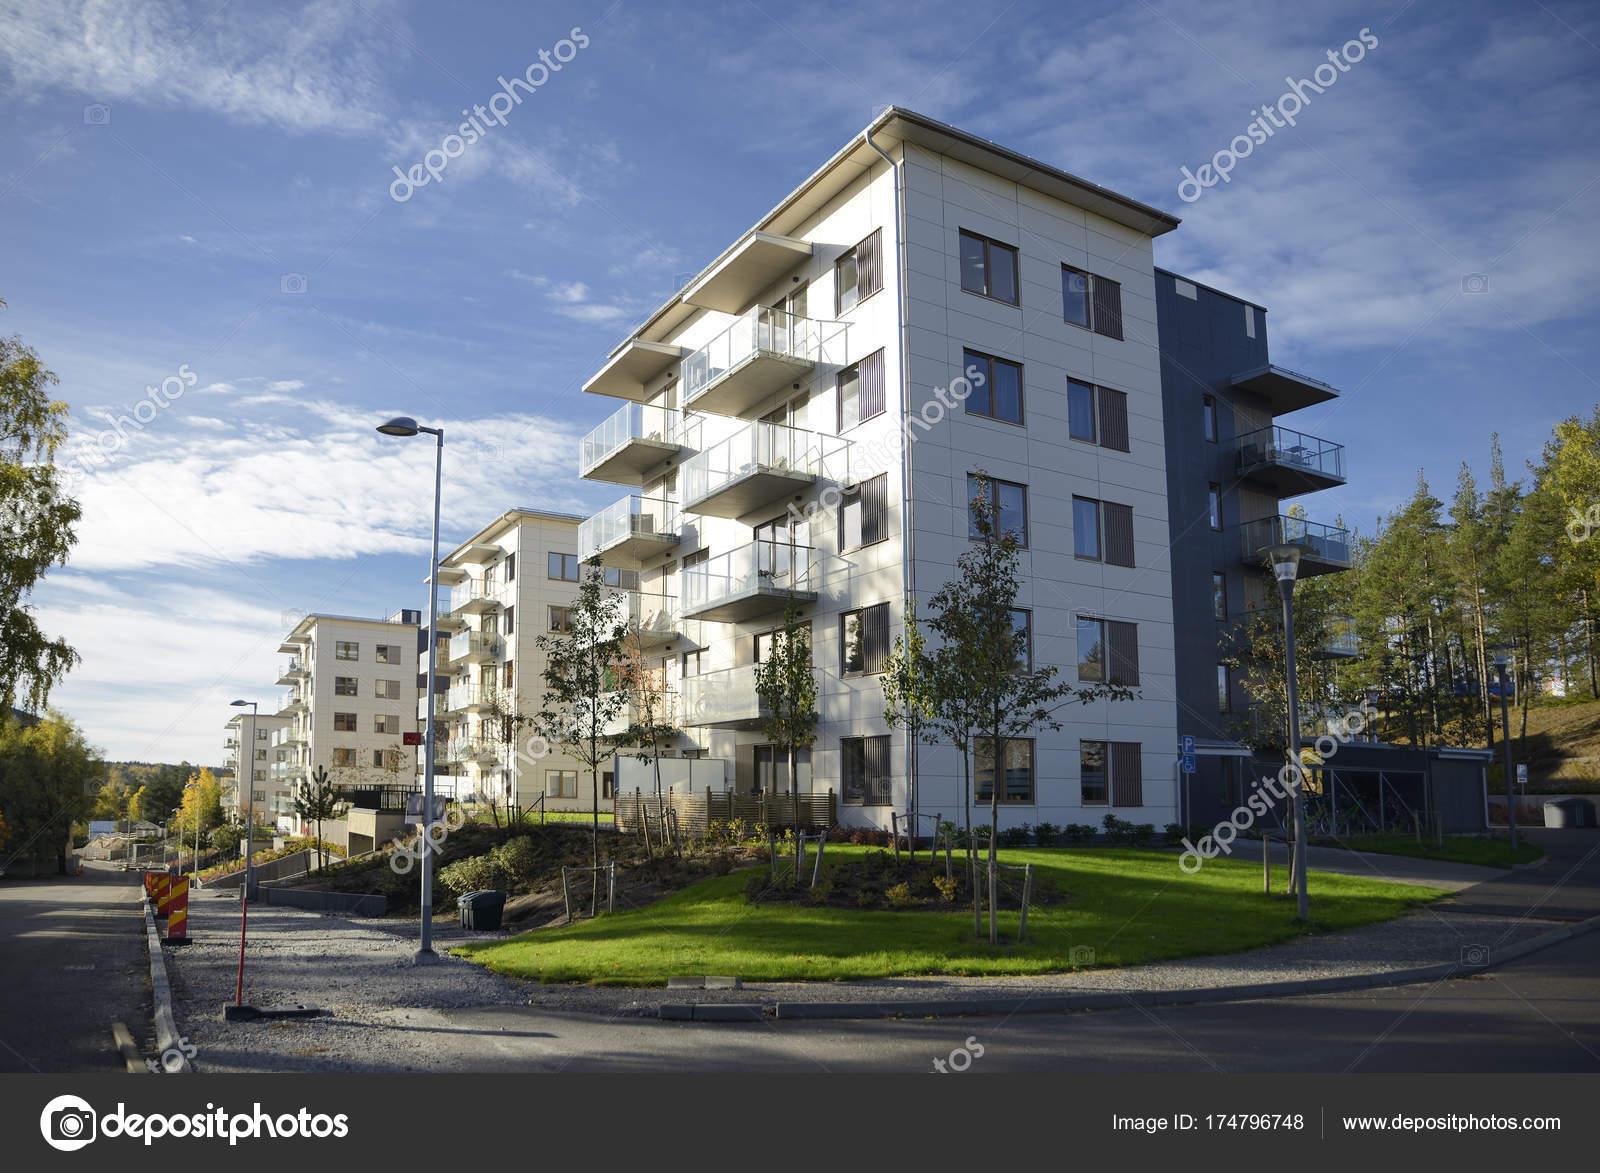 Moderne Mehrfamilienhäuser Bilder sind moderne mehrfamilienhäuser stockholm schweden stockfoto